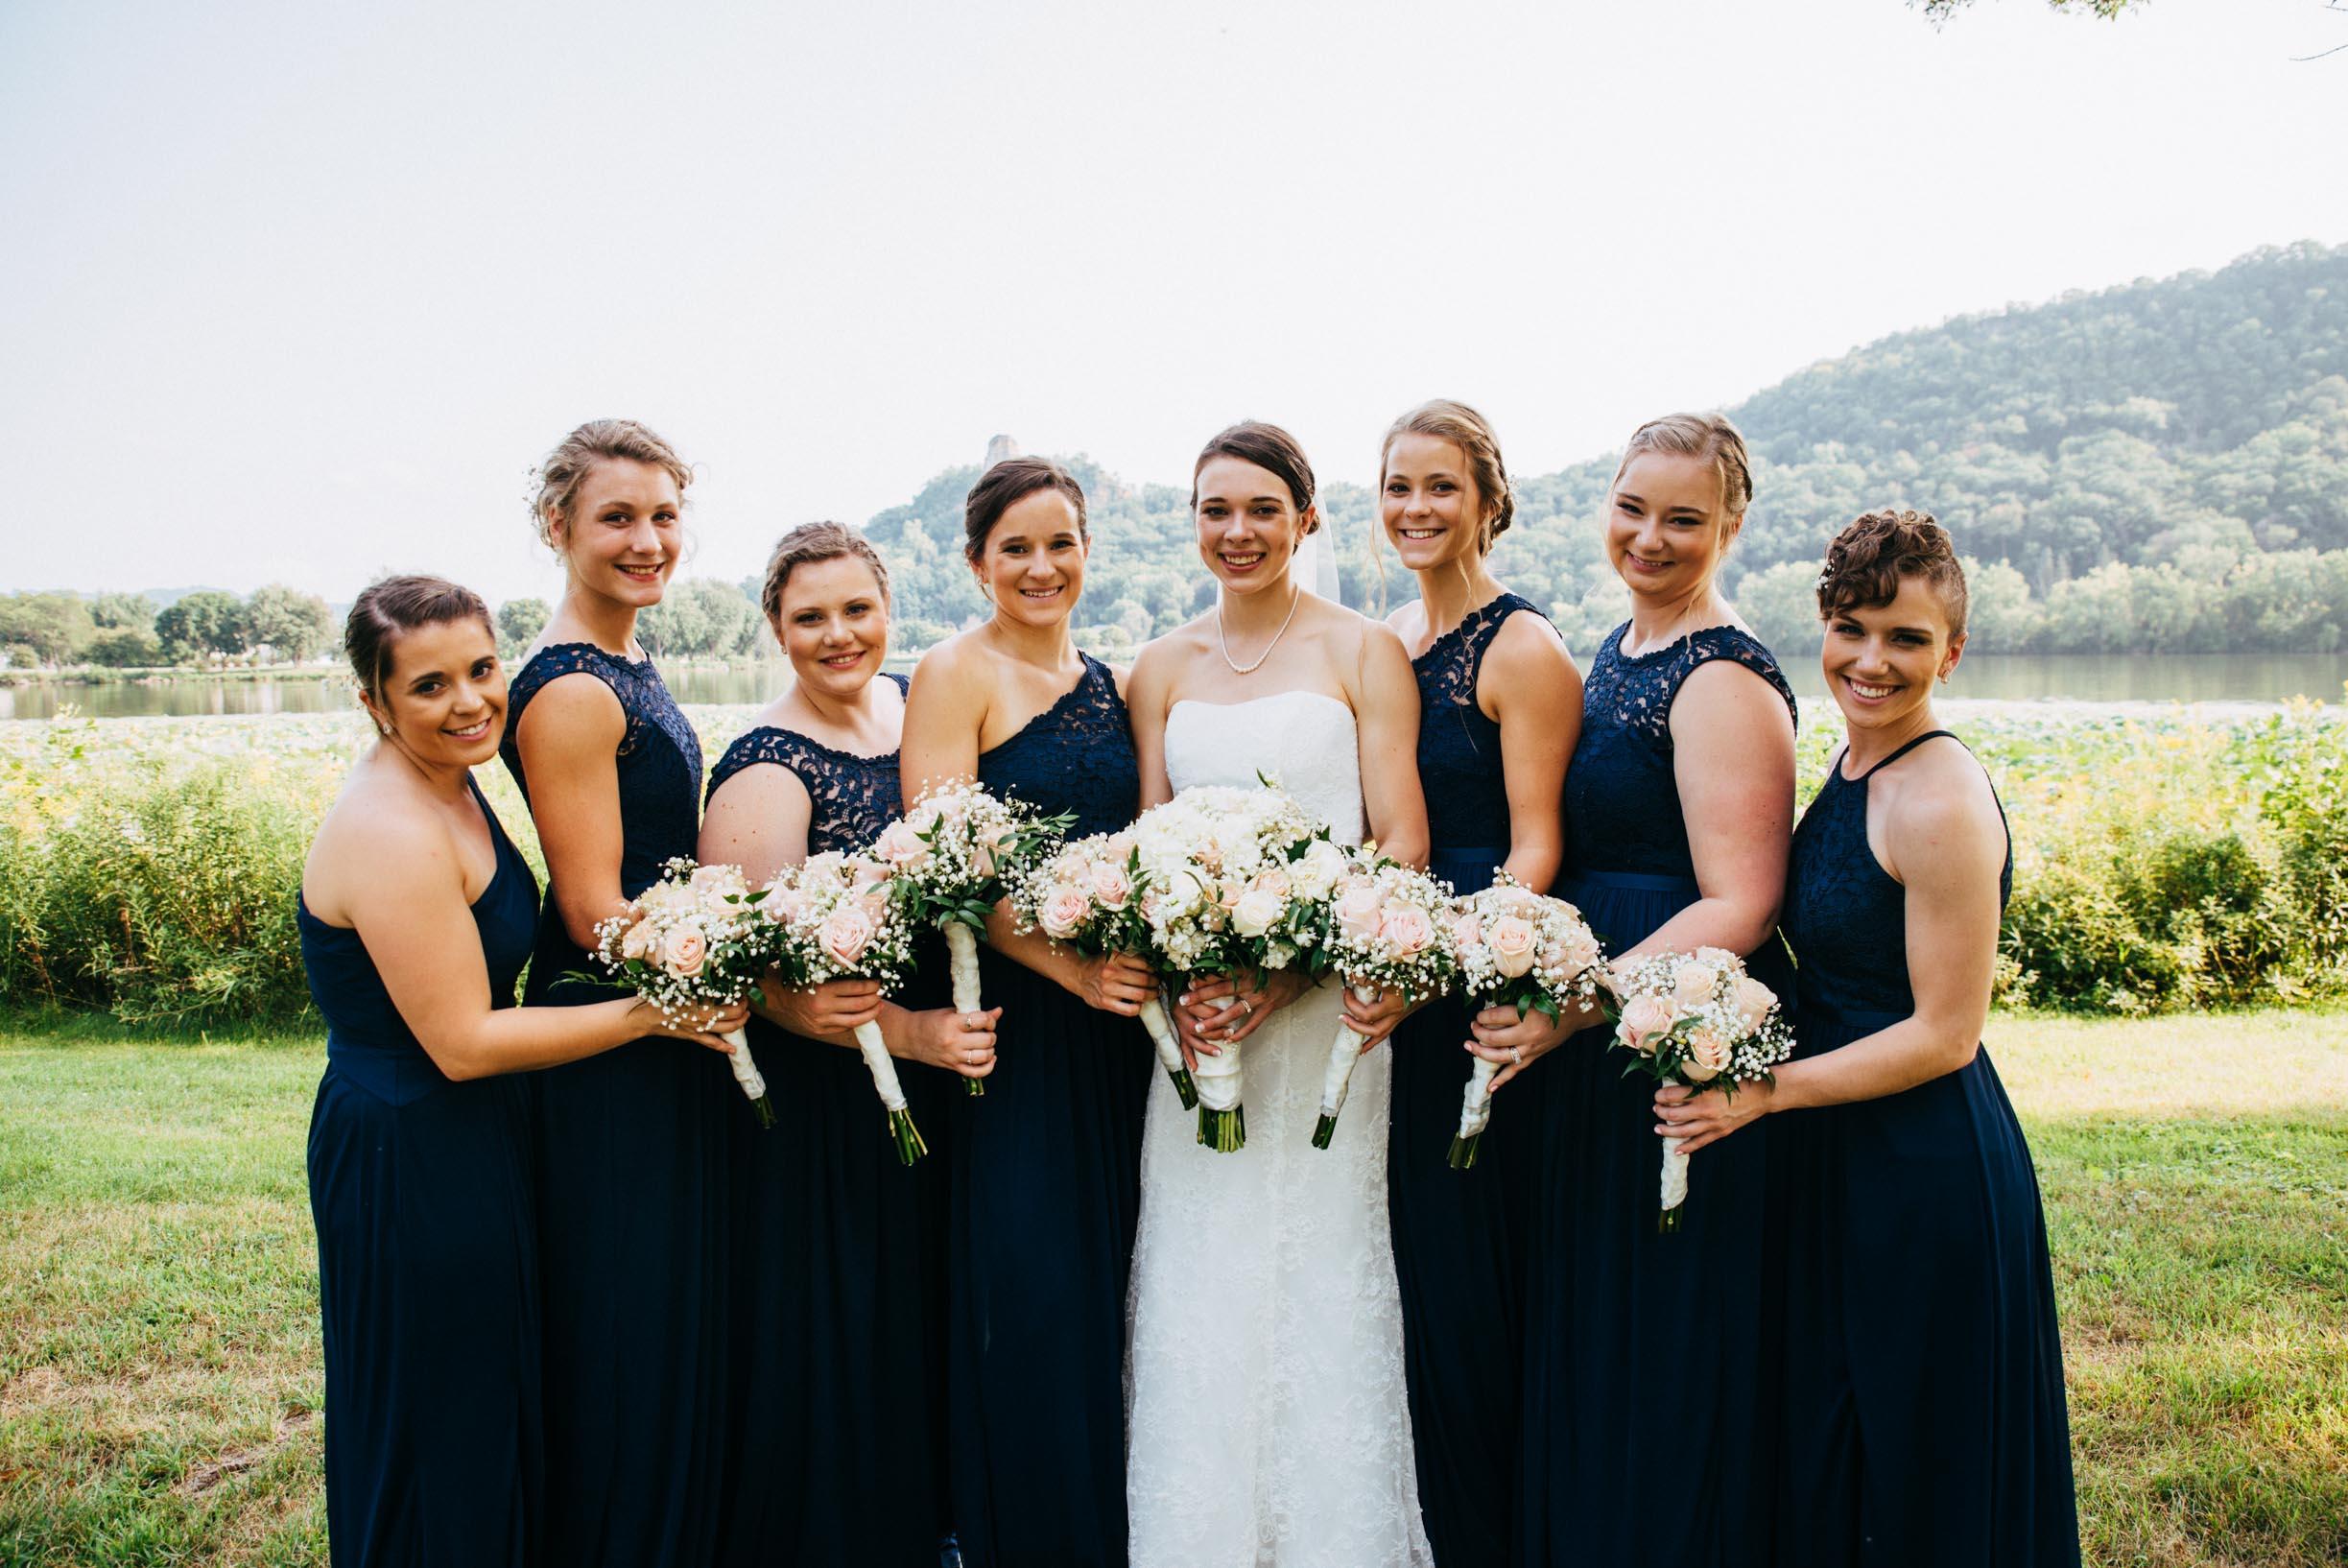 21-Lindsey Jake Wedding Wedding Party Portraits Winona.jpg